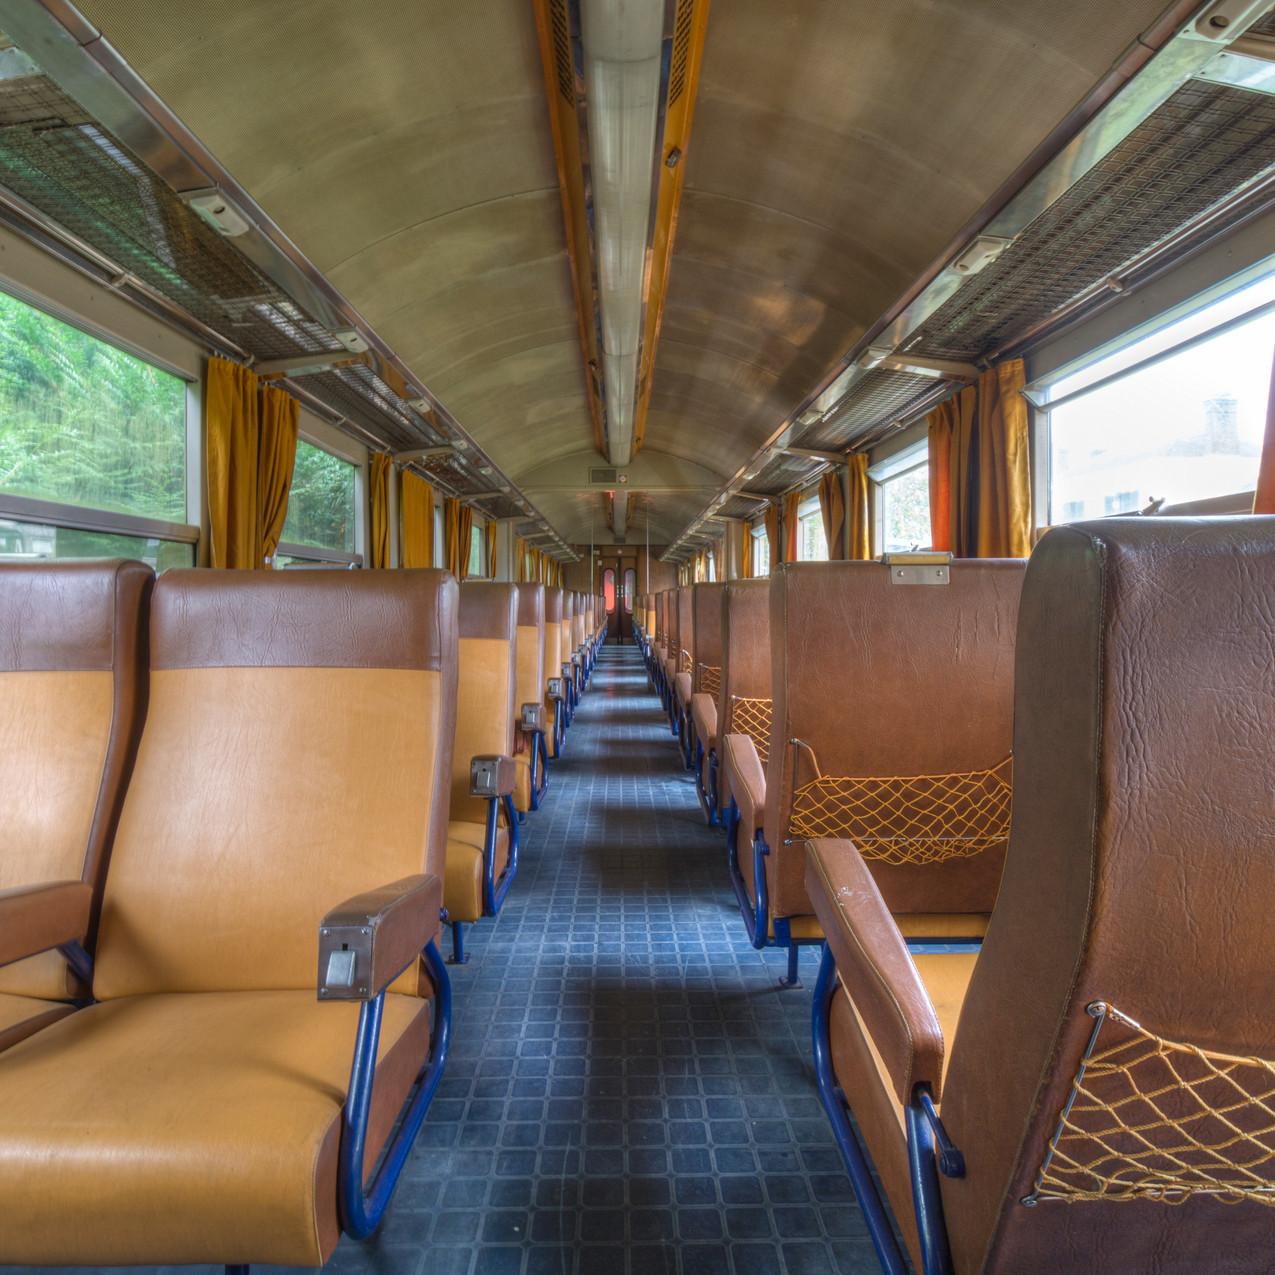 Urbex - Cimetière du train boudin 14 (Cuir corail)